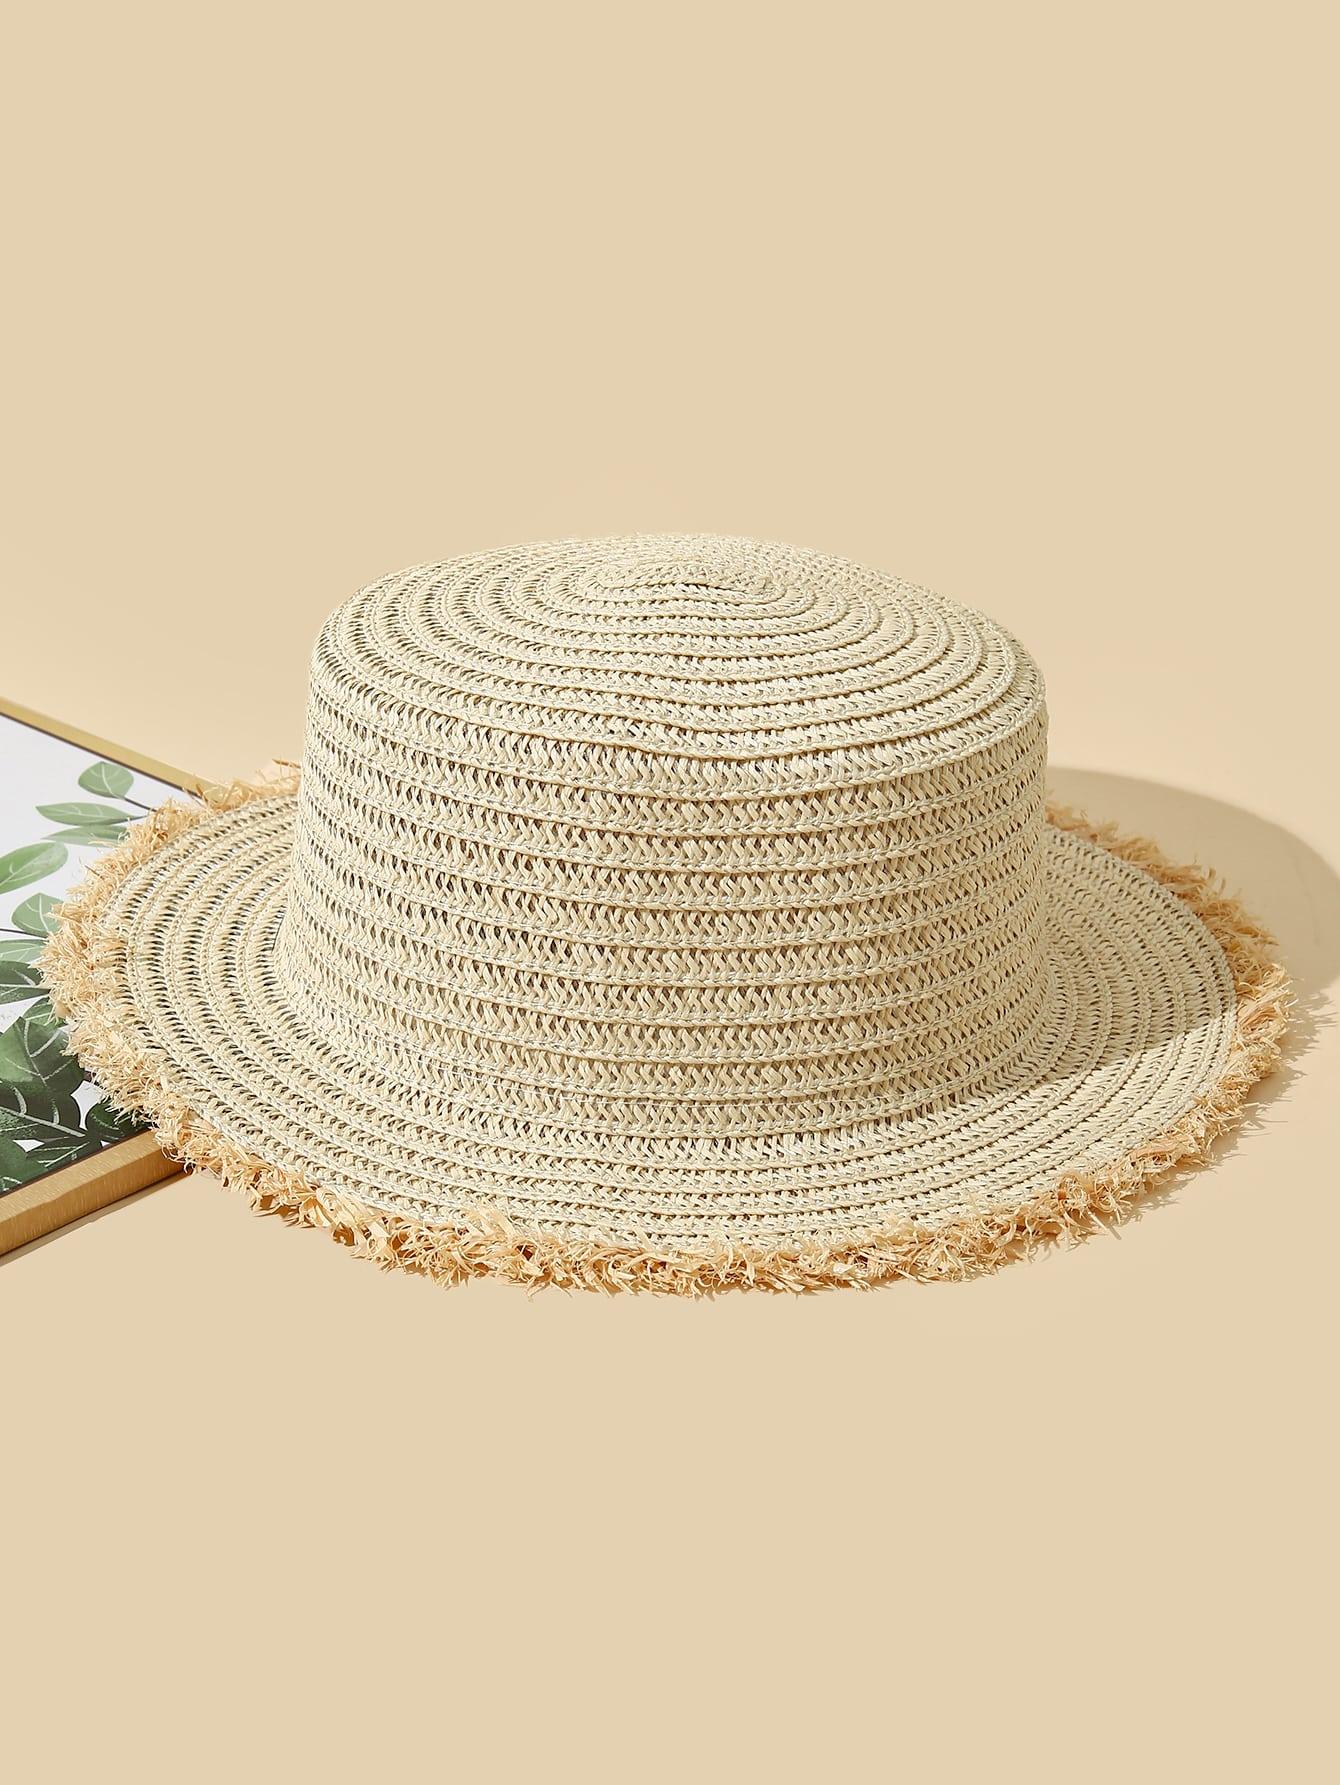 sun protection straw hat